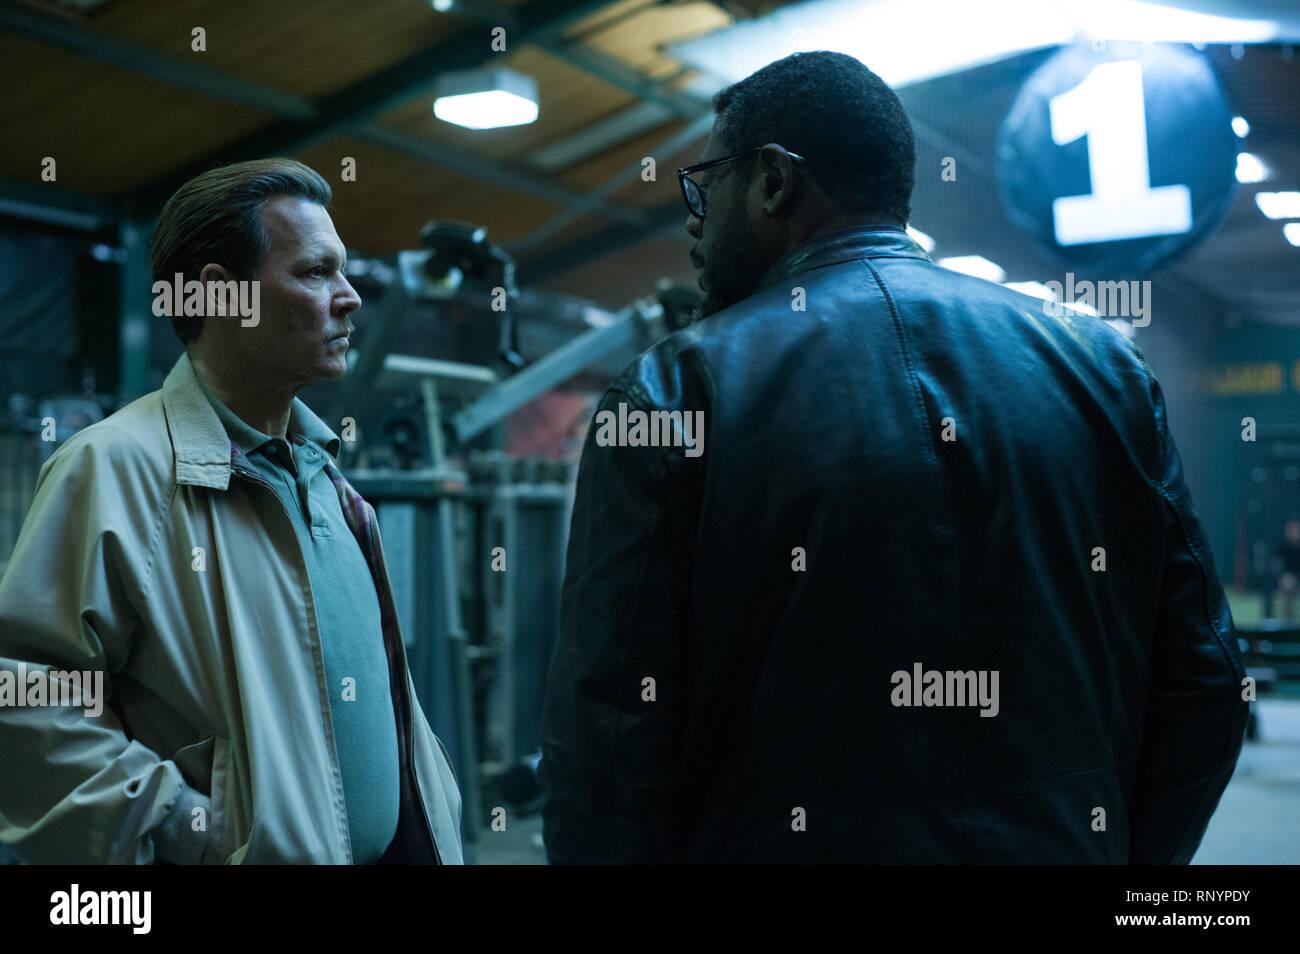 City Of Lies 2018 De Brad Furman Johnny Depp Forest Whitaker